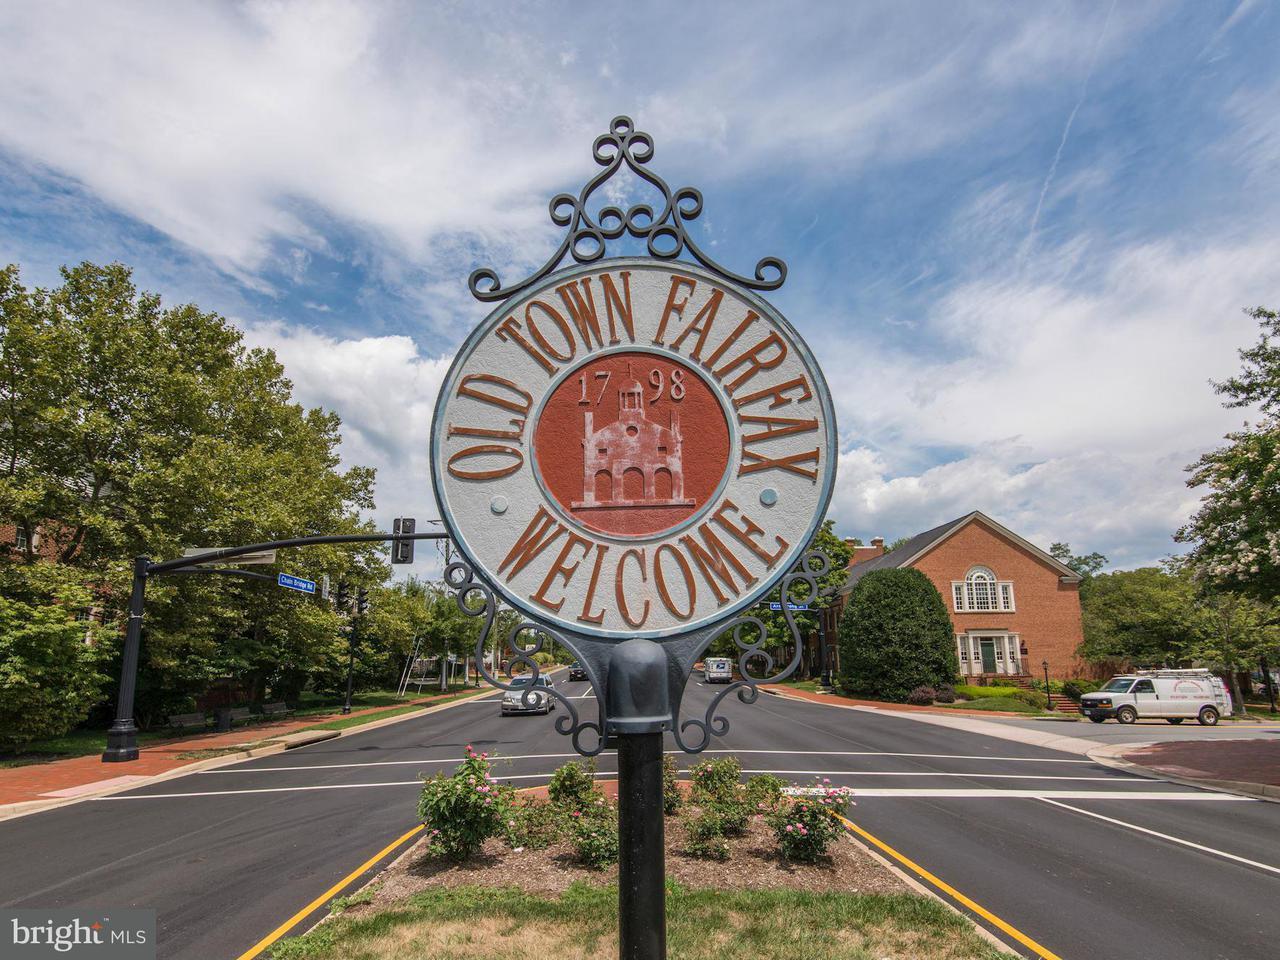 Additional photo for property listing at 3989 Norton Pl #201 3989 Norton Pl #201 Fairfax, Virginia 22030 Estados Unidos